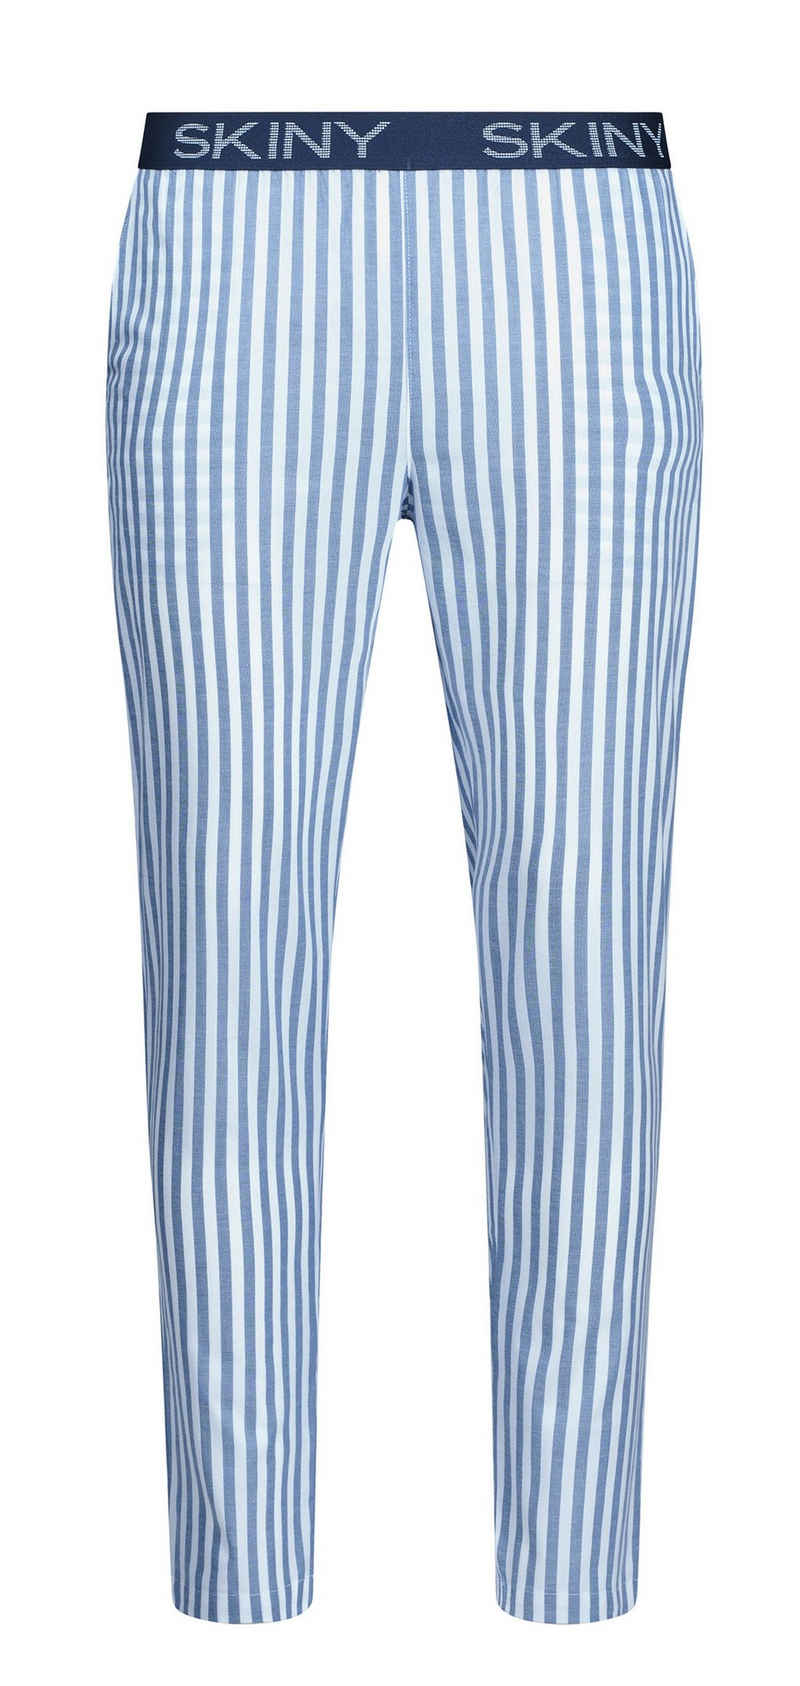 Skiny Pyjamahose »Skiny Herren Schlafanzughose« (1-tlg) Baumwolle